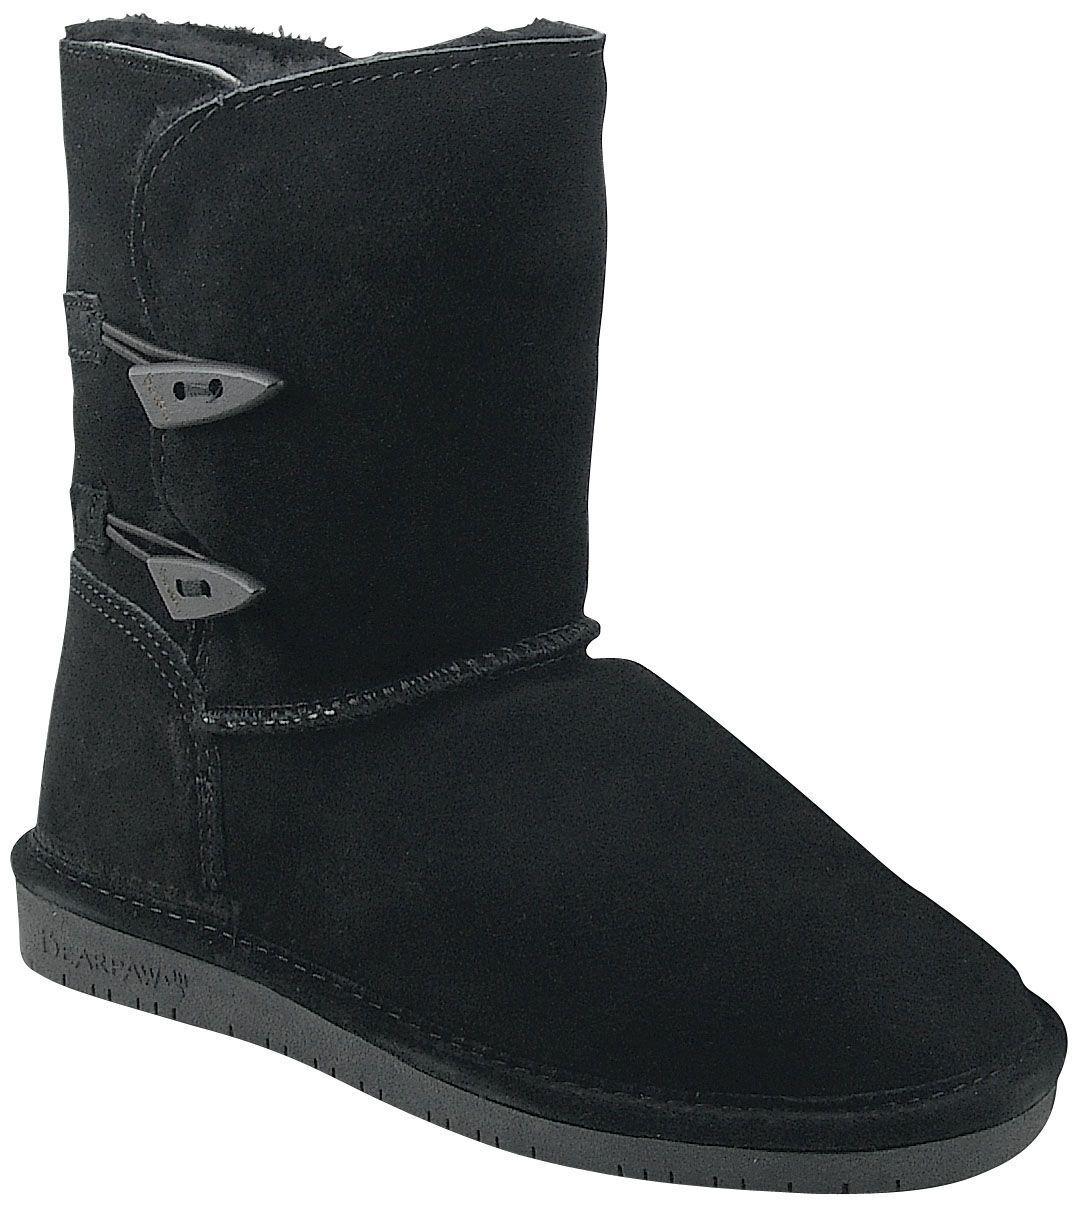 Donna Bearpaw Abigail Boot Nero Nero Boot Size 6 #NT999-889 4c508b